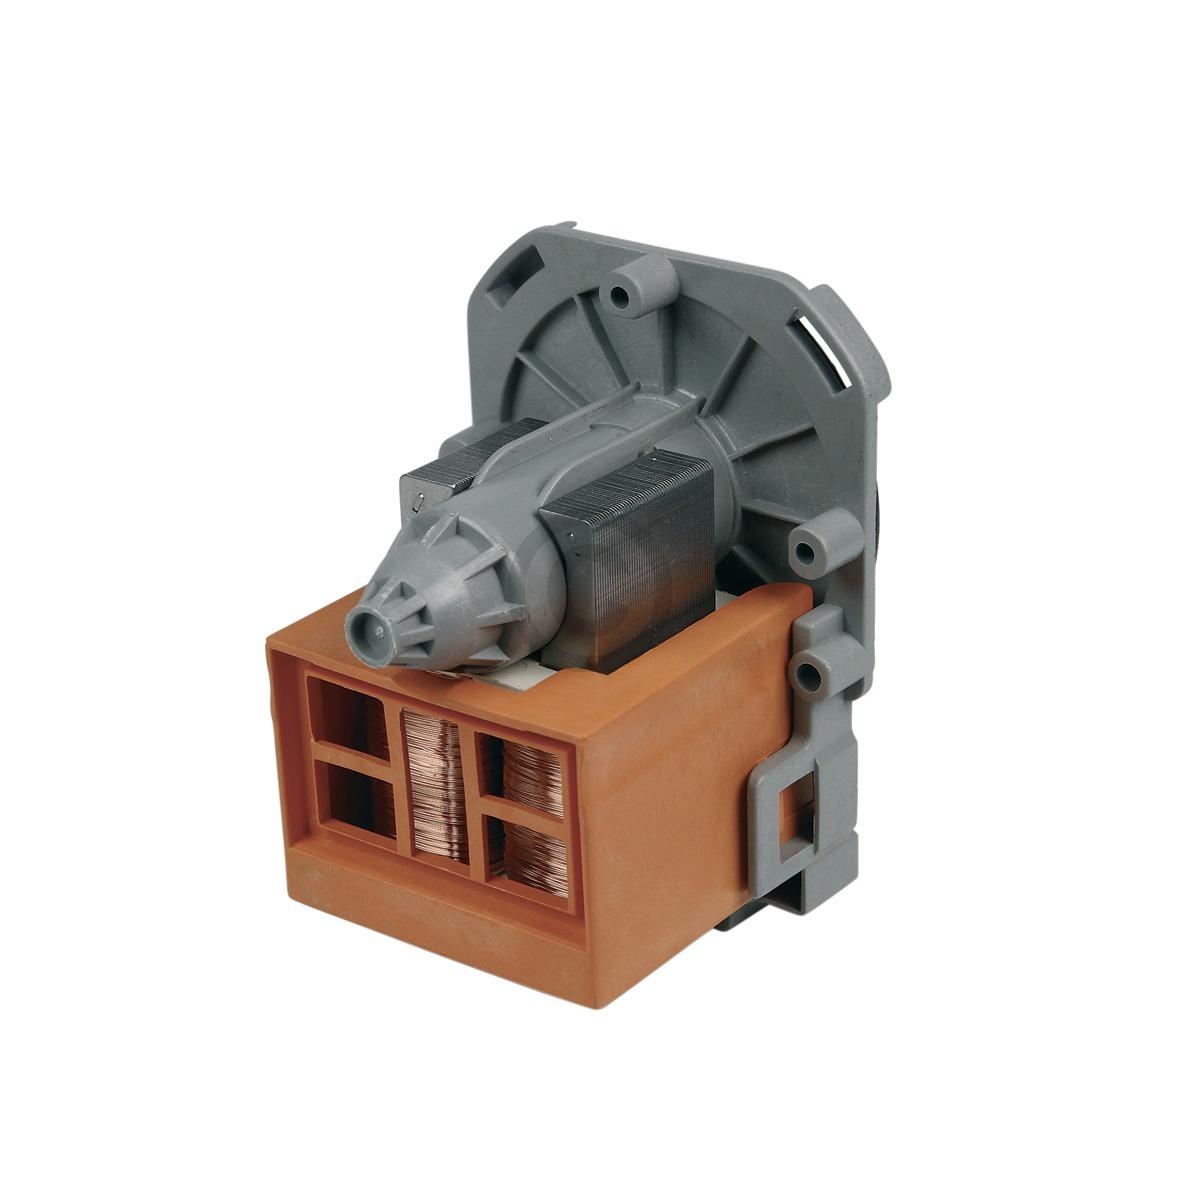 Ablaufpumpe wie Bosch 00141874 00144484 alternativer Pumpenmotor